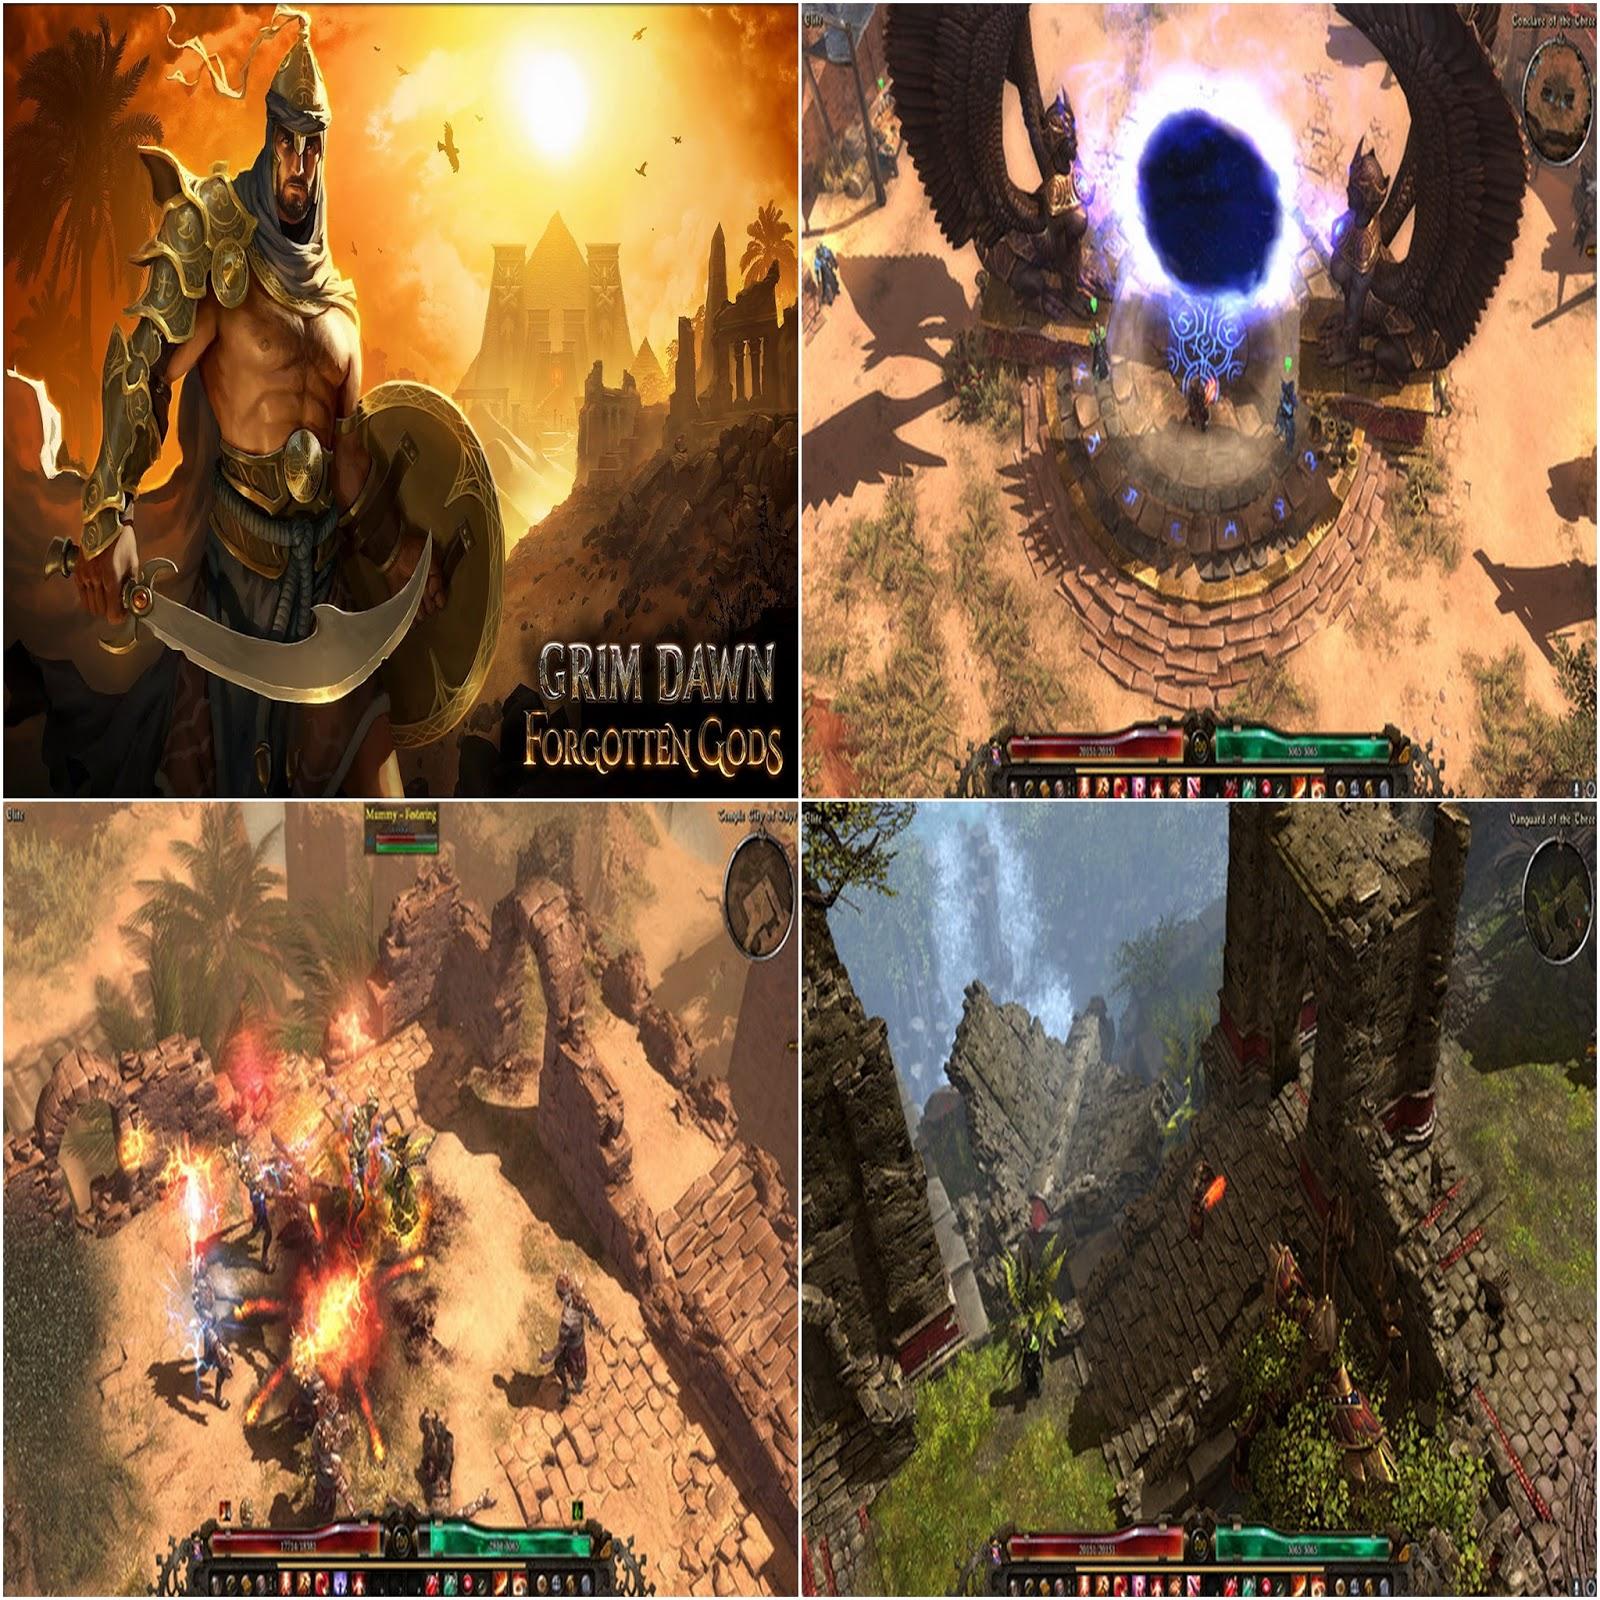 Grim Dawn Forgotten Gods (v1 1 2 0) | Game Experience